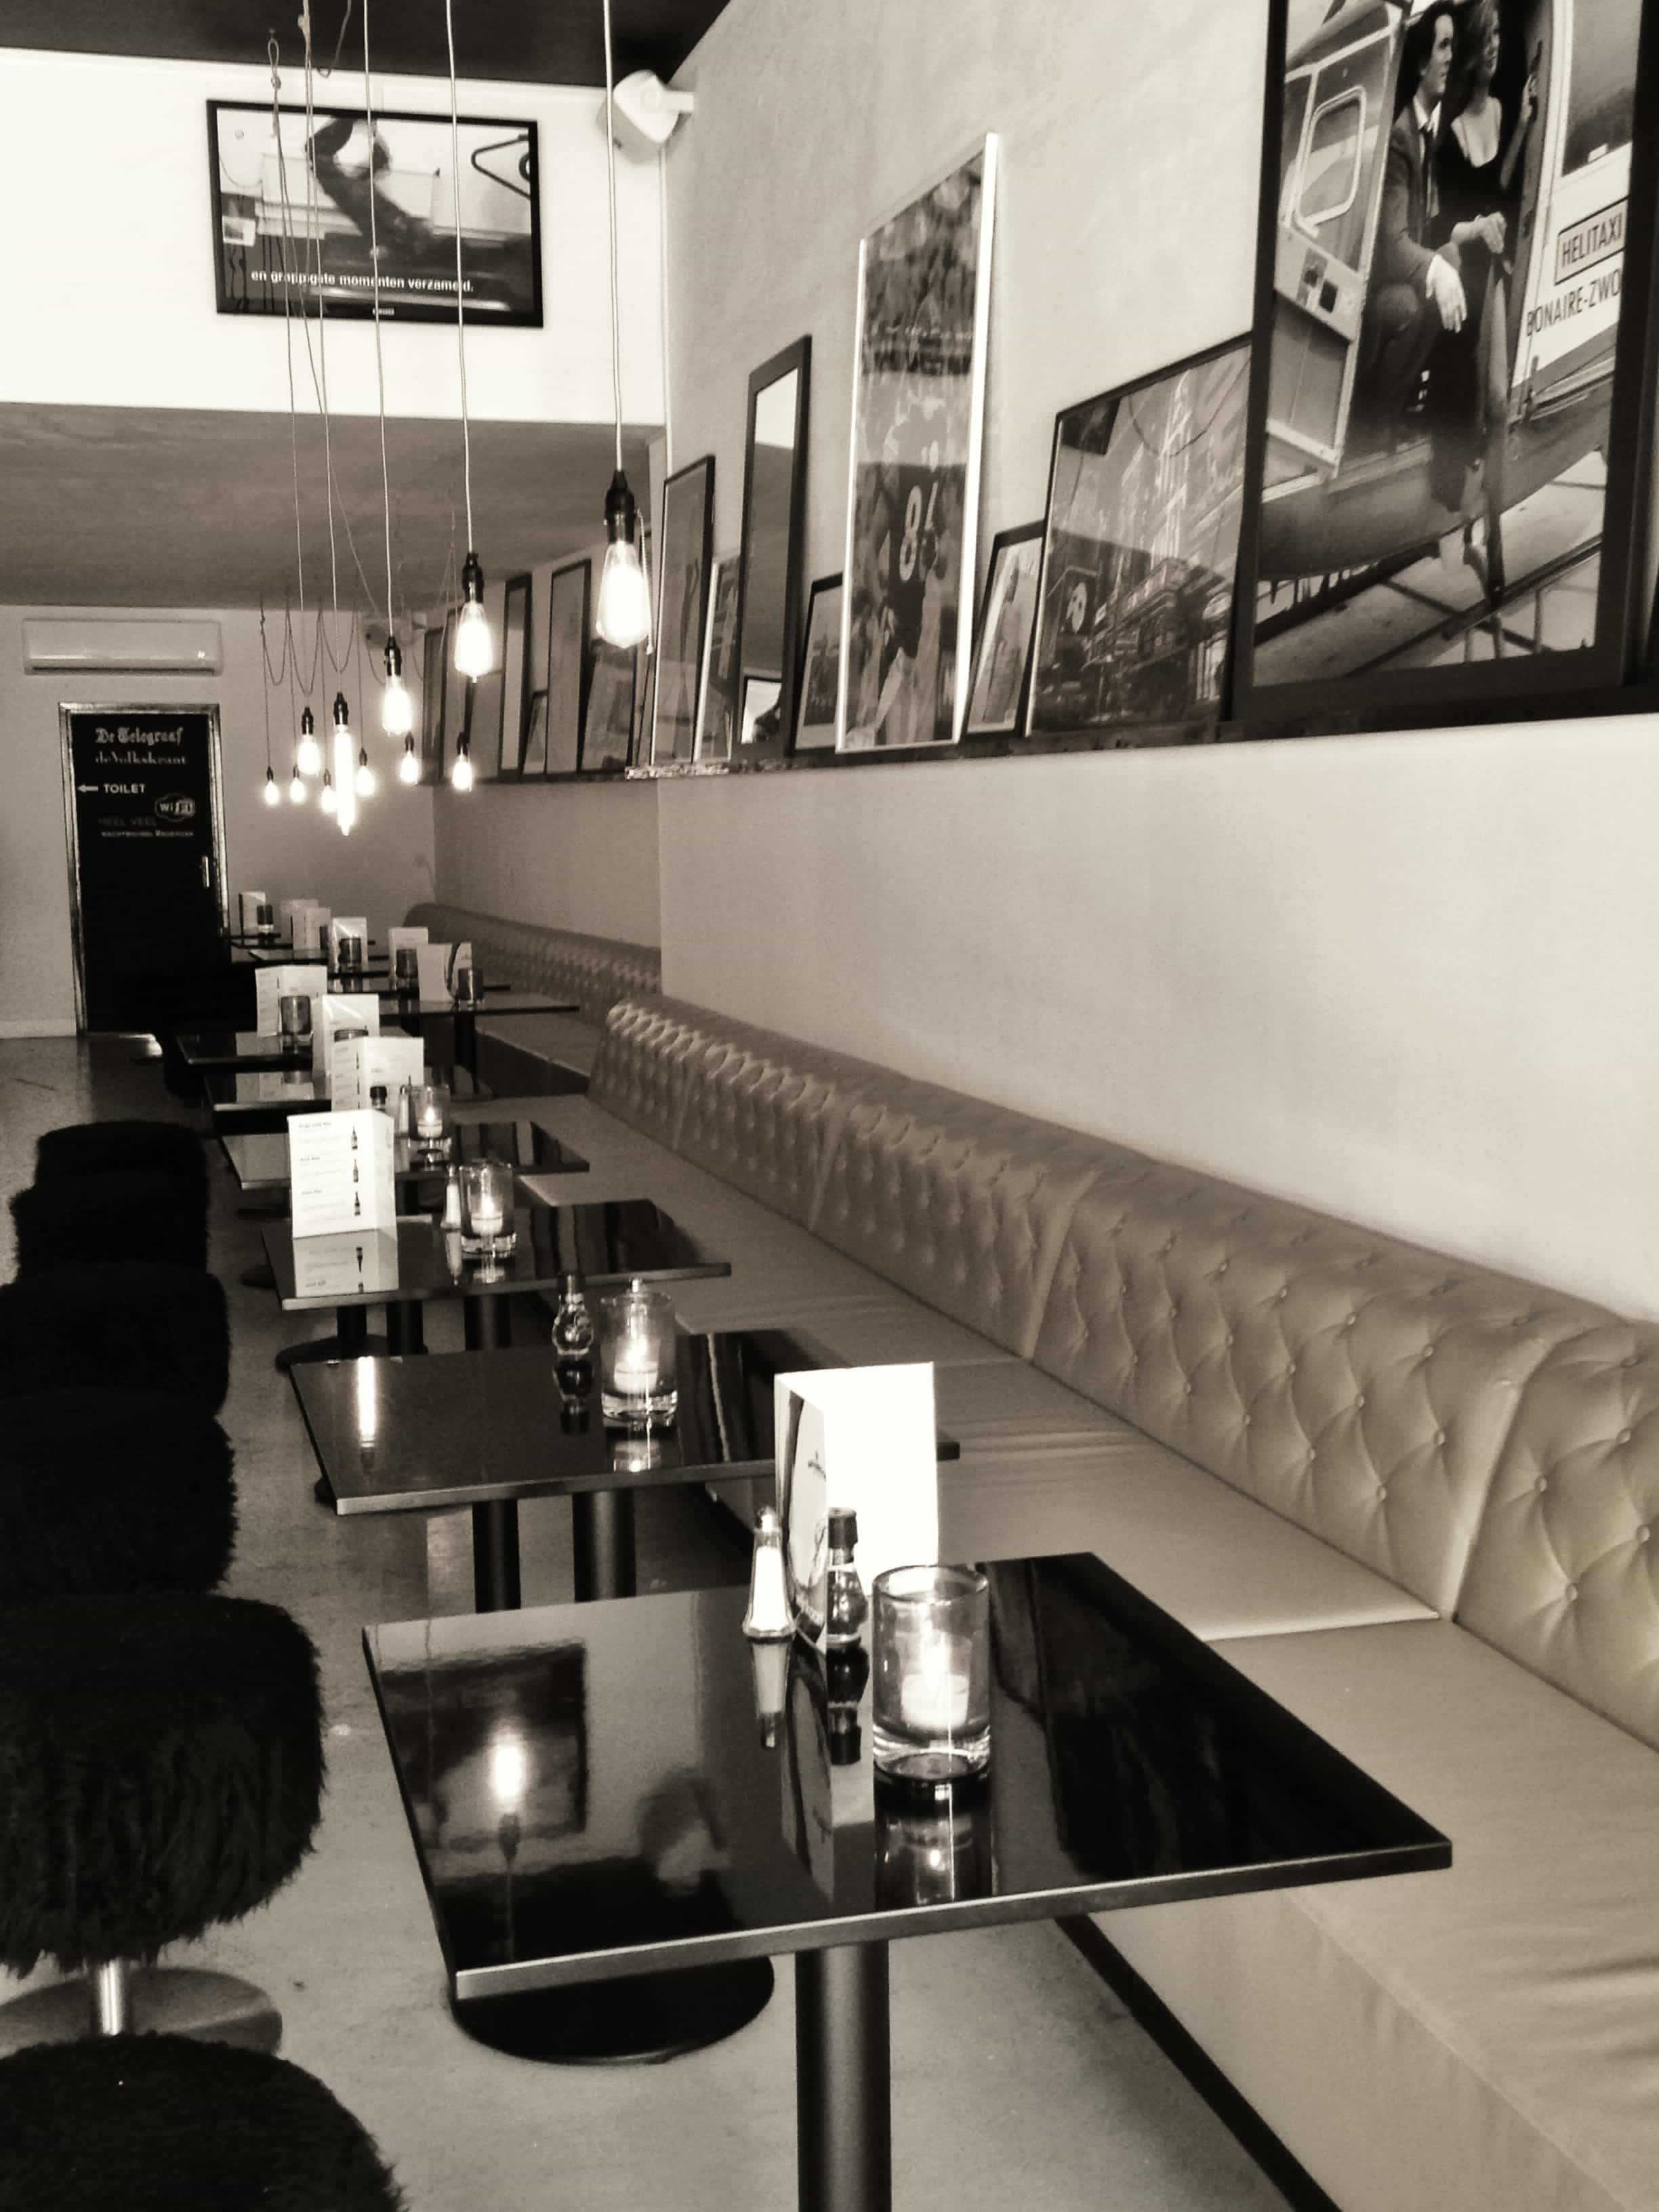 Bar en Brood, Bar en Brood zwolle, lunchroom zwolle, bar zwolle, Travel Rumors, restaurant zwolle, lunch zwolle, uiteten zwolle